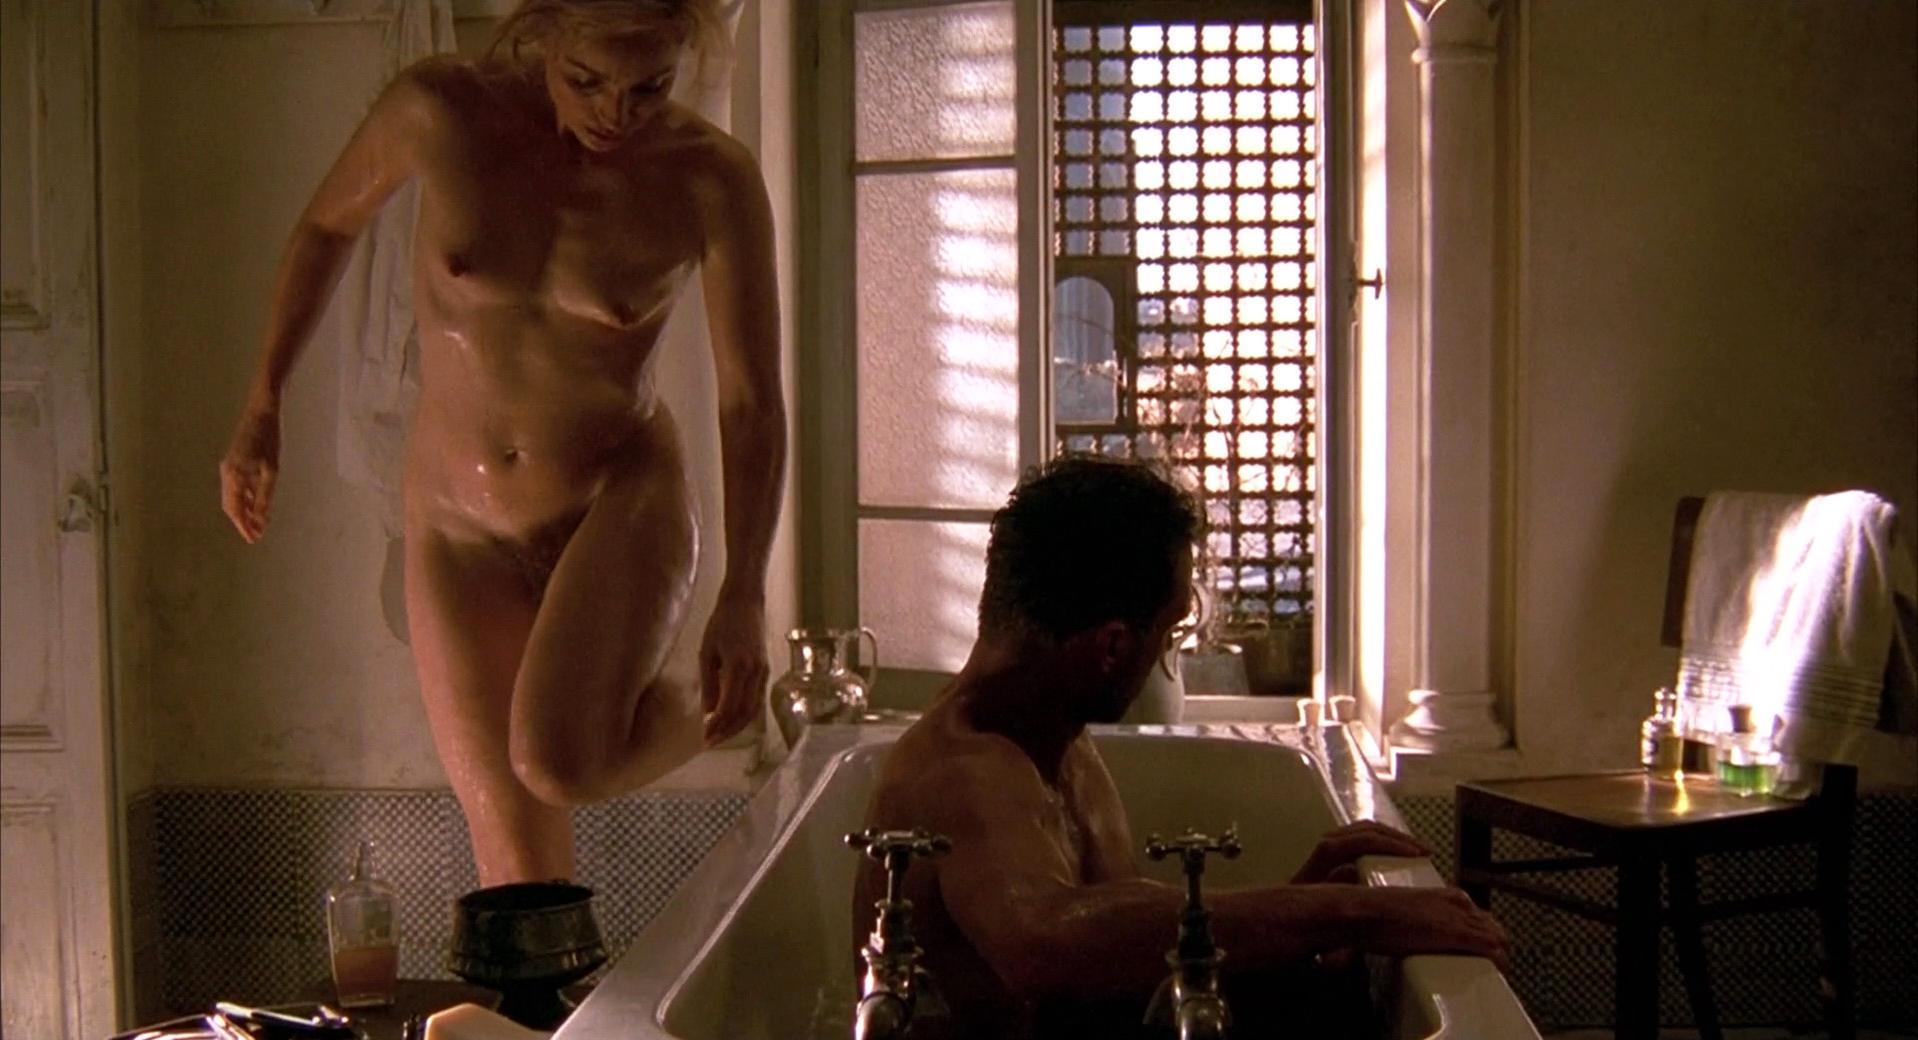 Kristin scott thomas fully nude picture captures